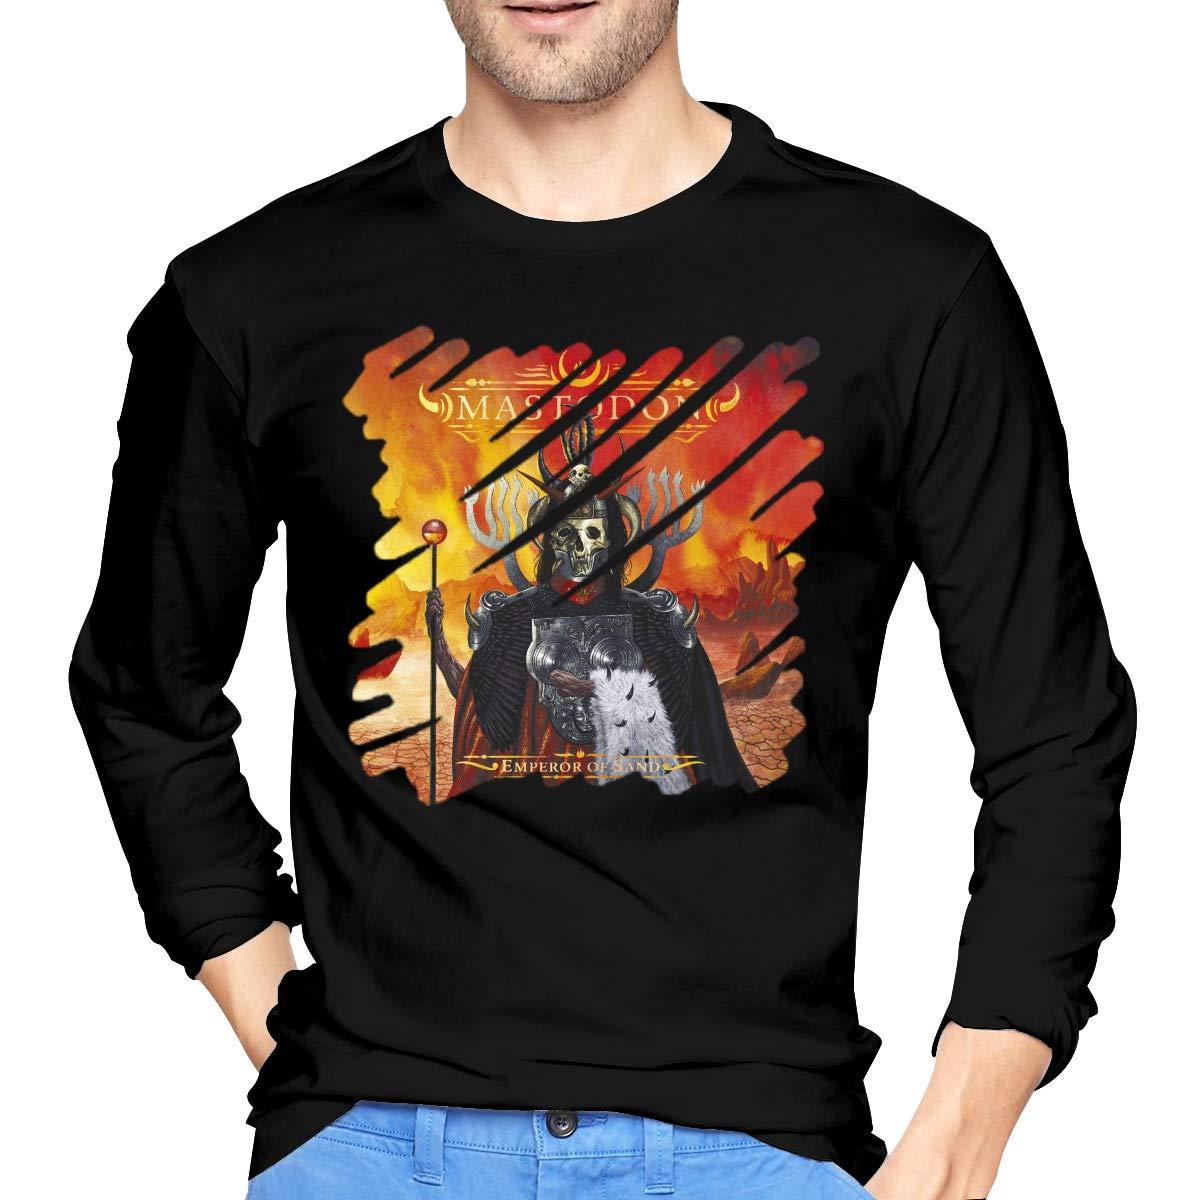 Tianpf Mastodon Emperor Of Sand S T Shirts Tops Black